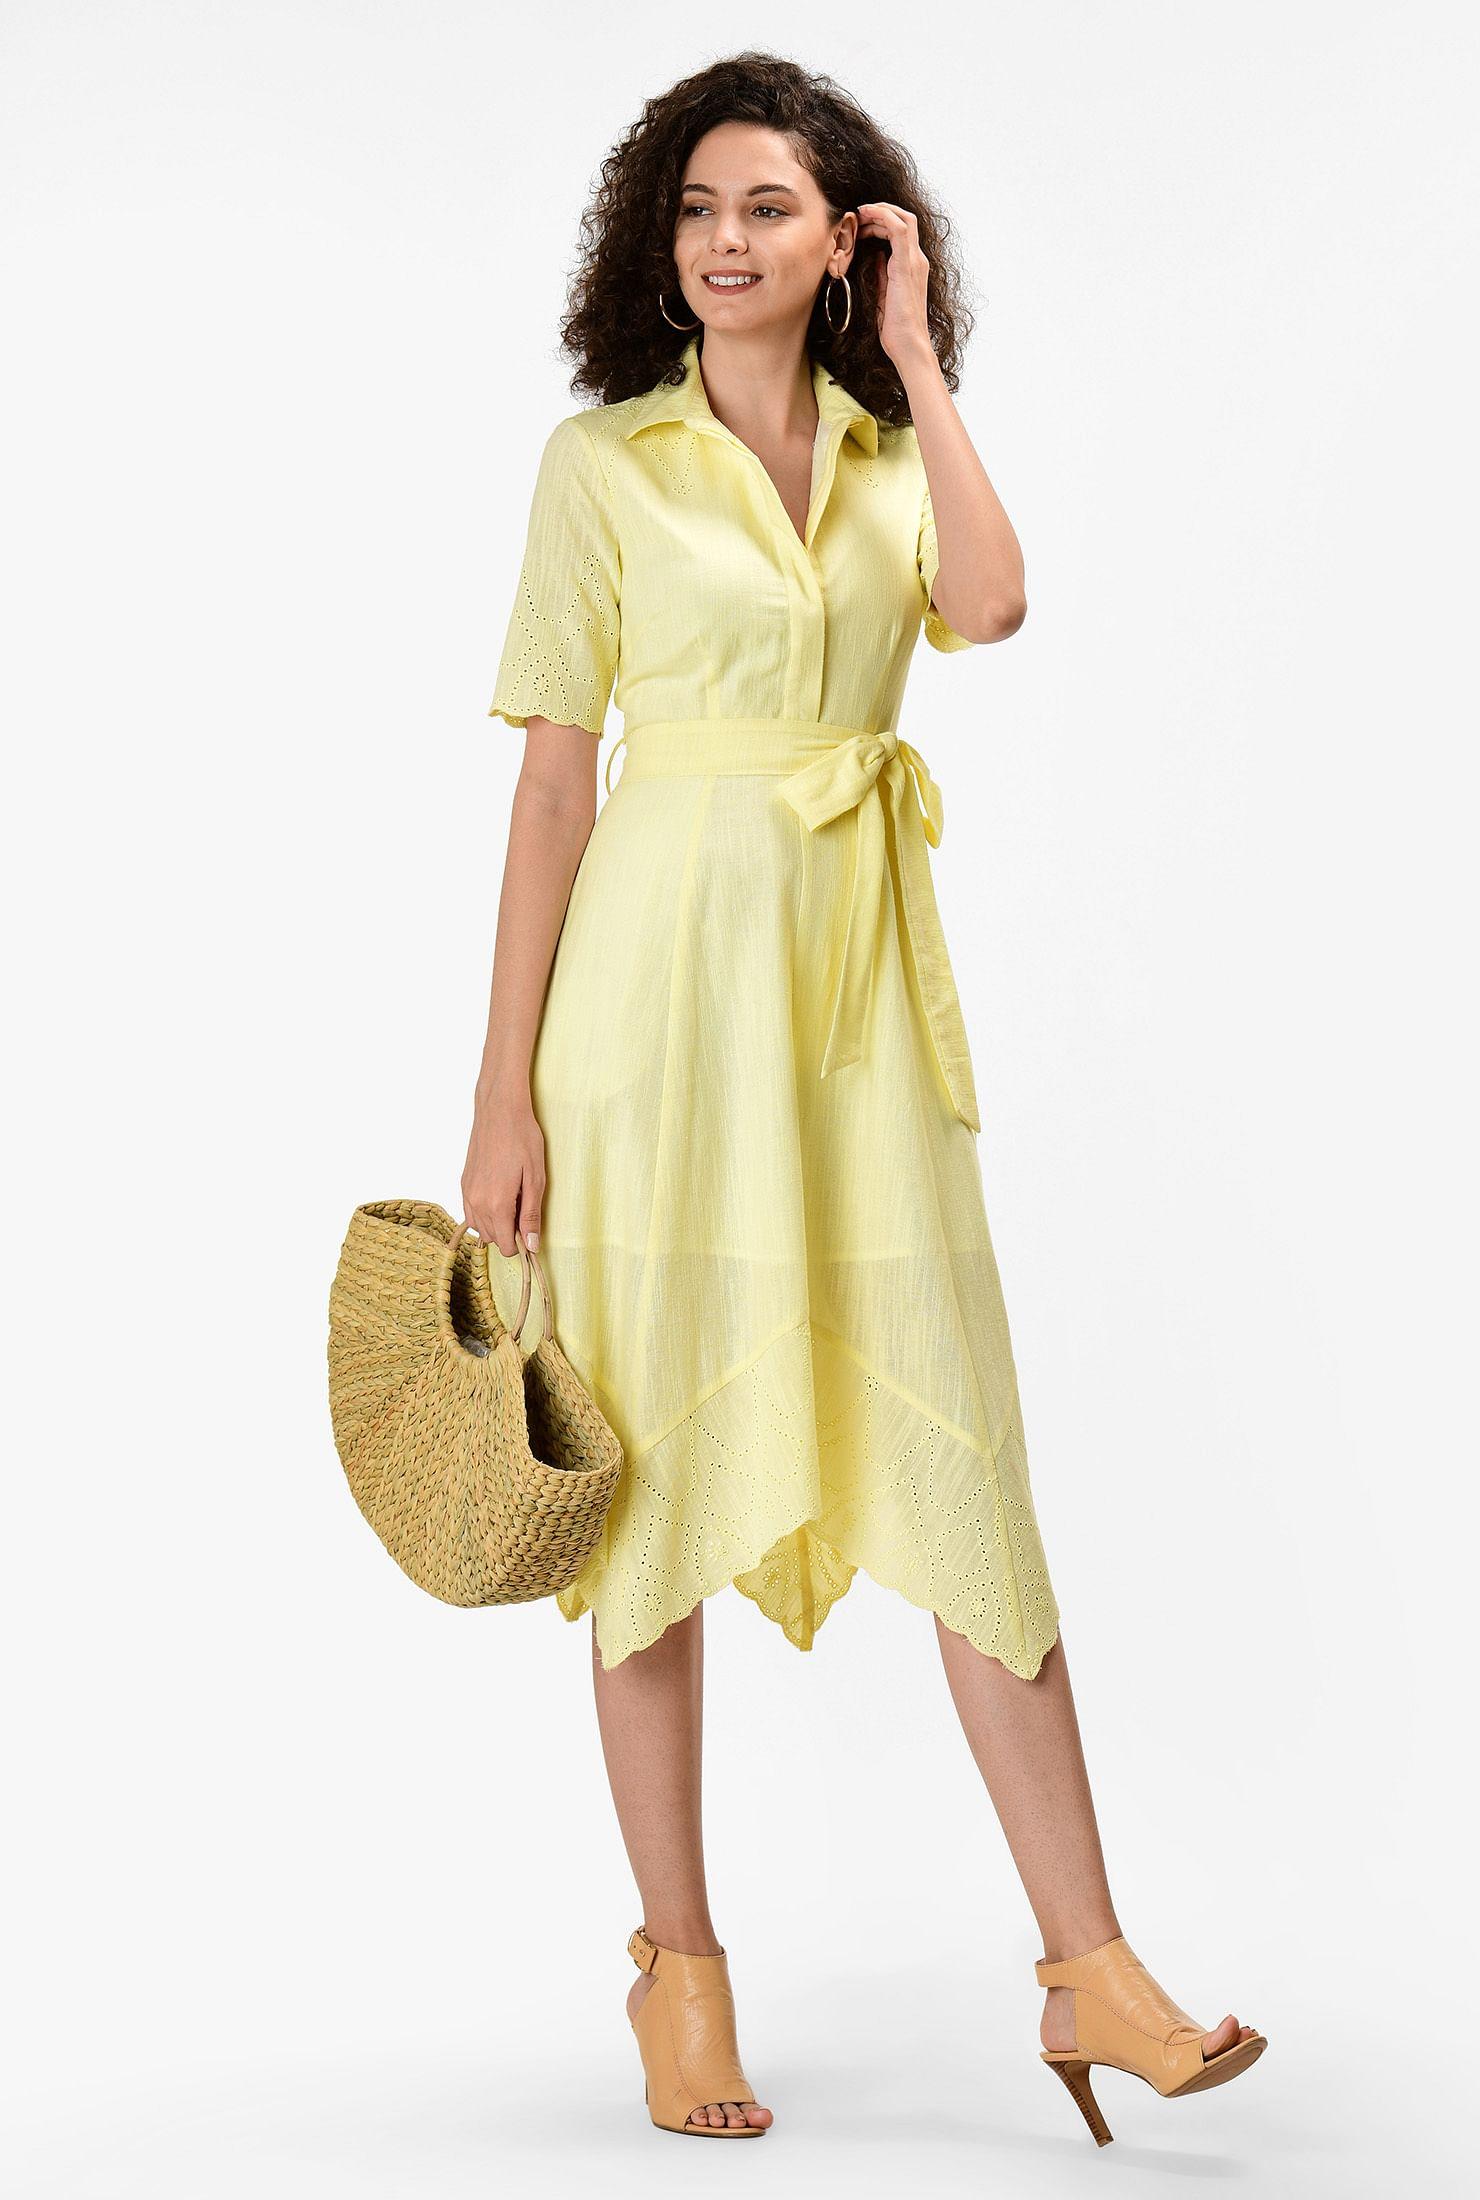 7c3496ffd363e Women's Fashion Clothing 0-36W and Custom